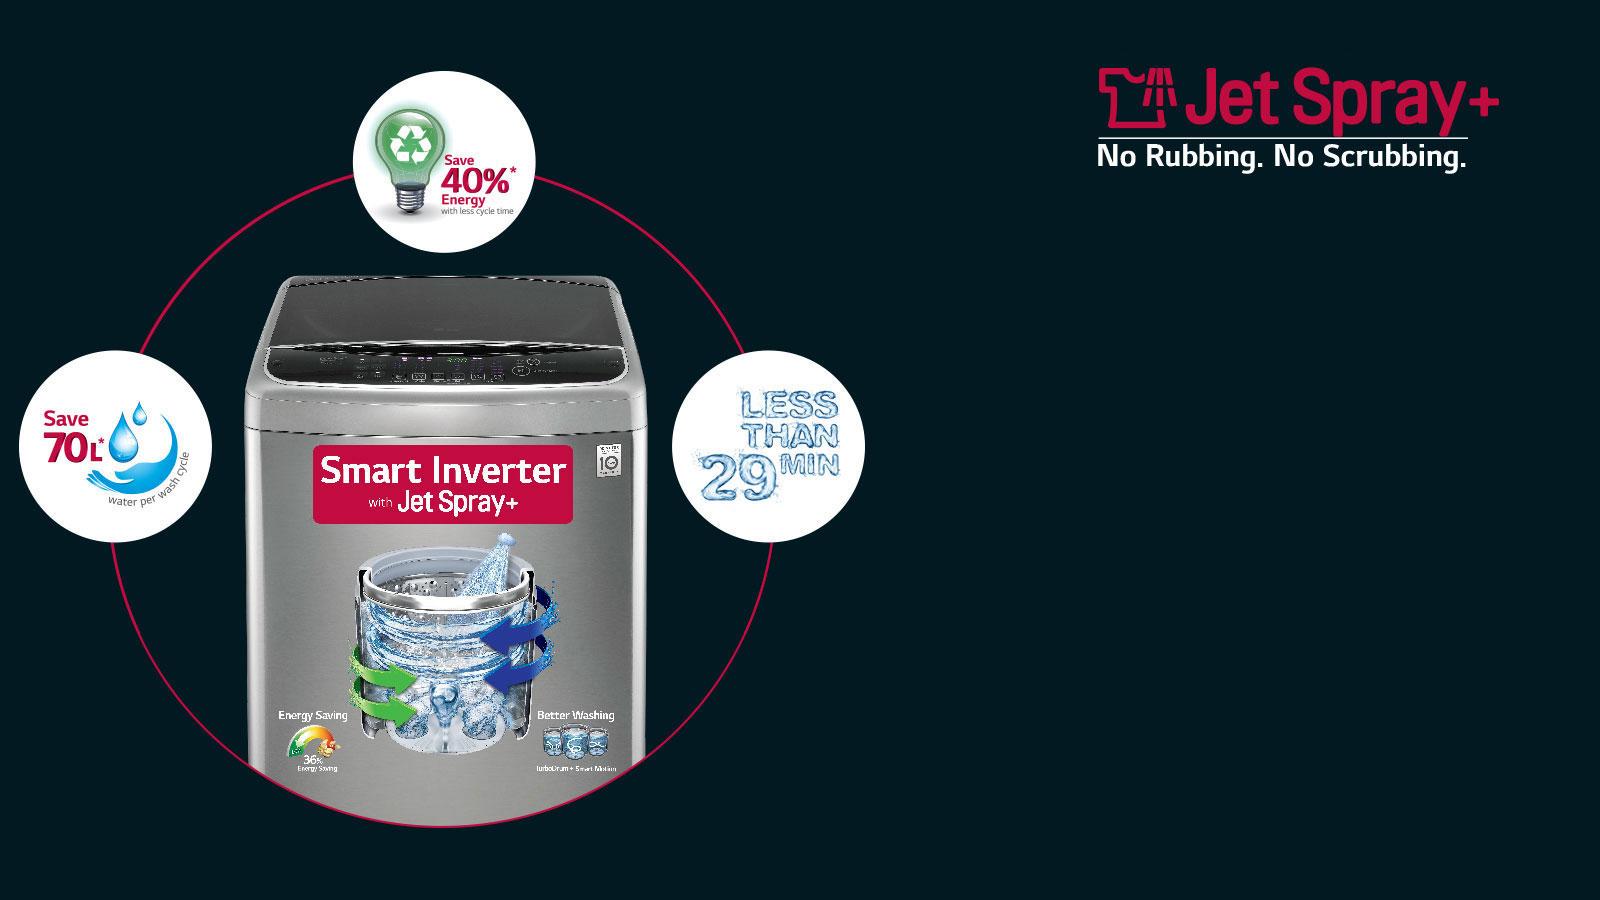 LG Jet Spray+ Washing Machine